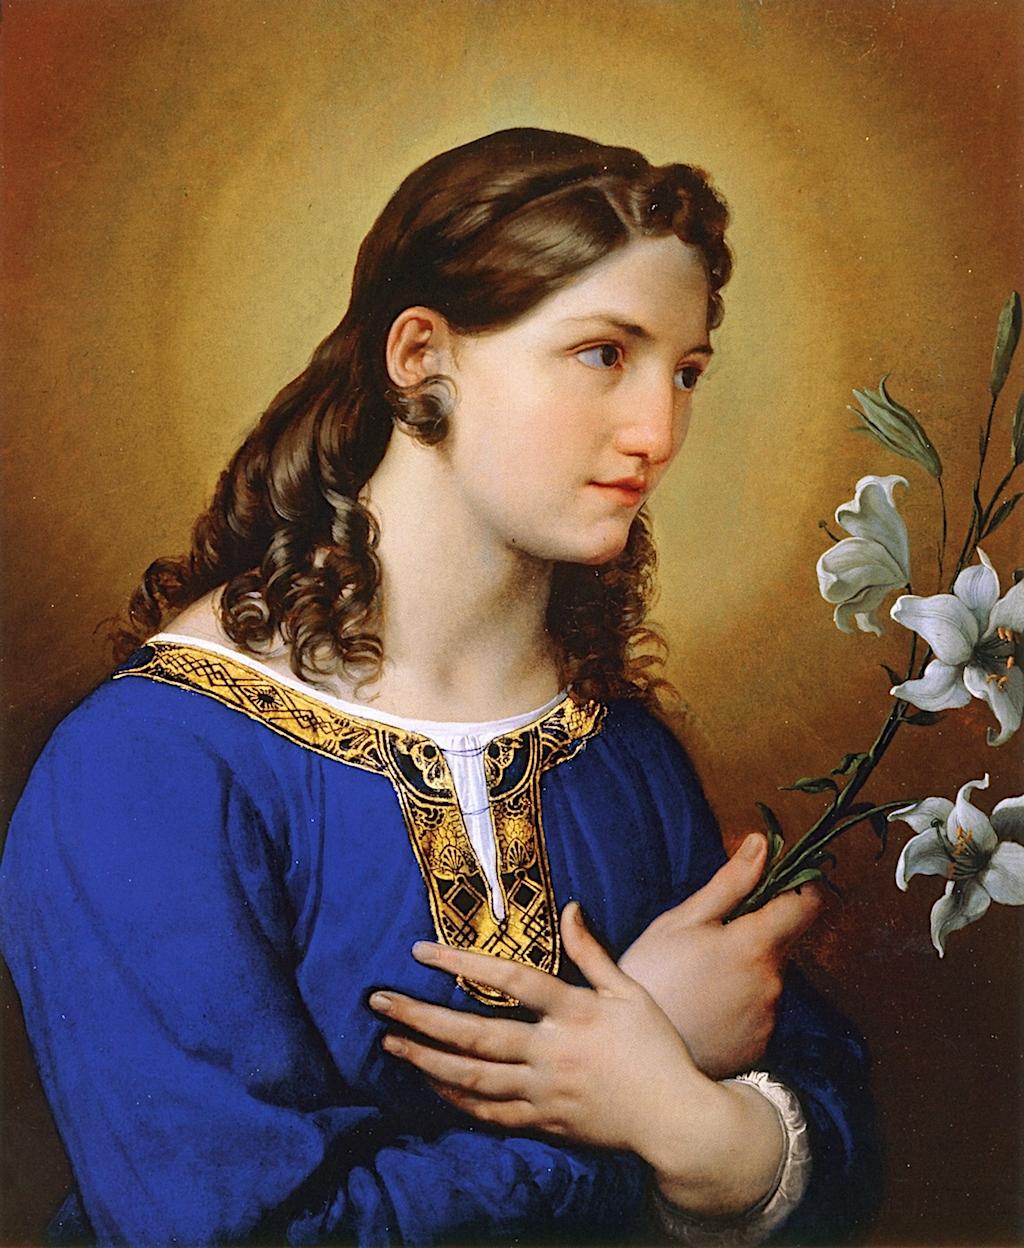 天使报喜_Angel of the Annunciation-弗朗切斯科·保罗·海耶兹